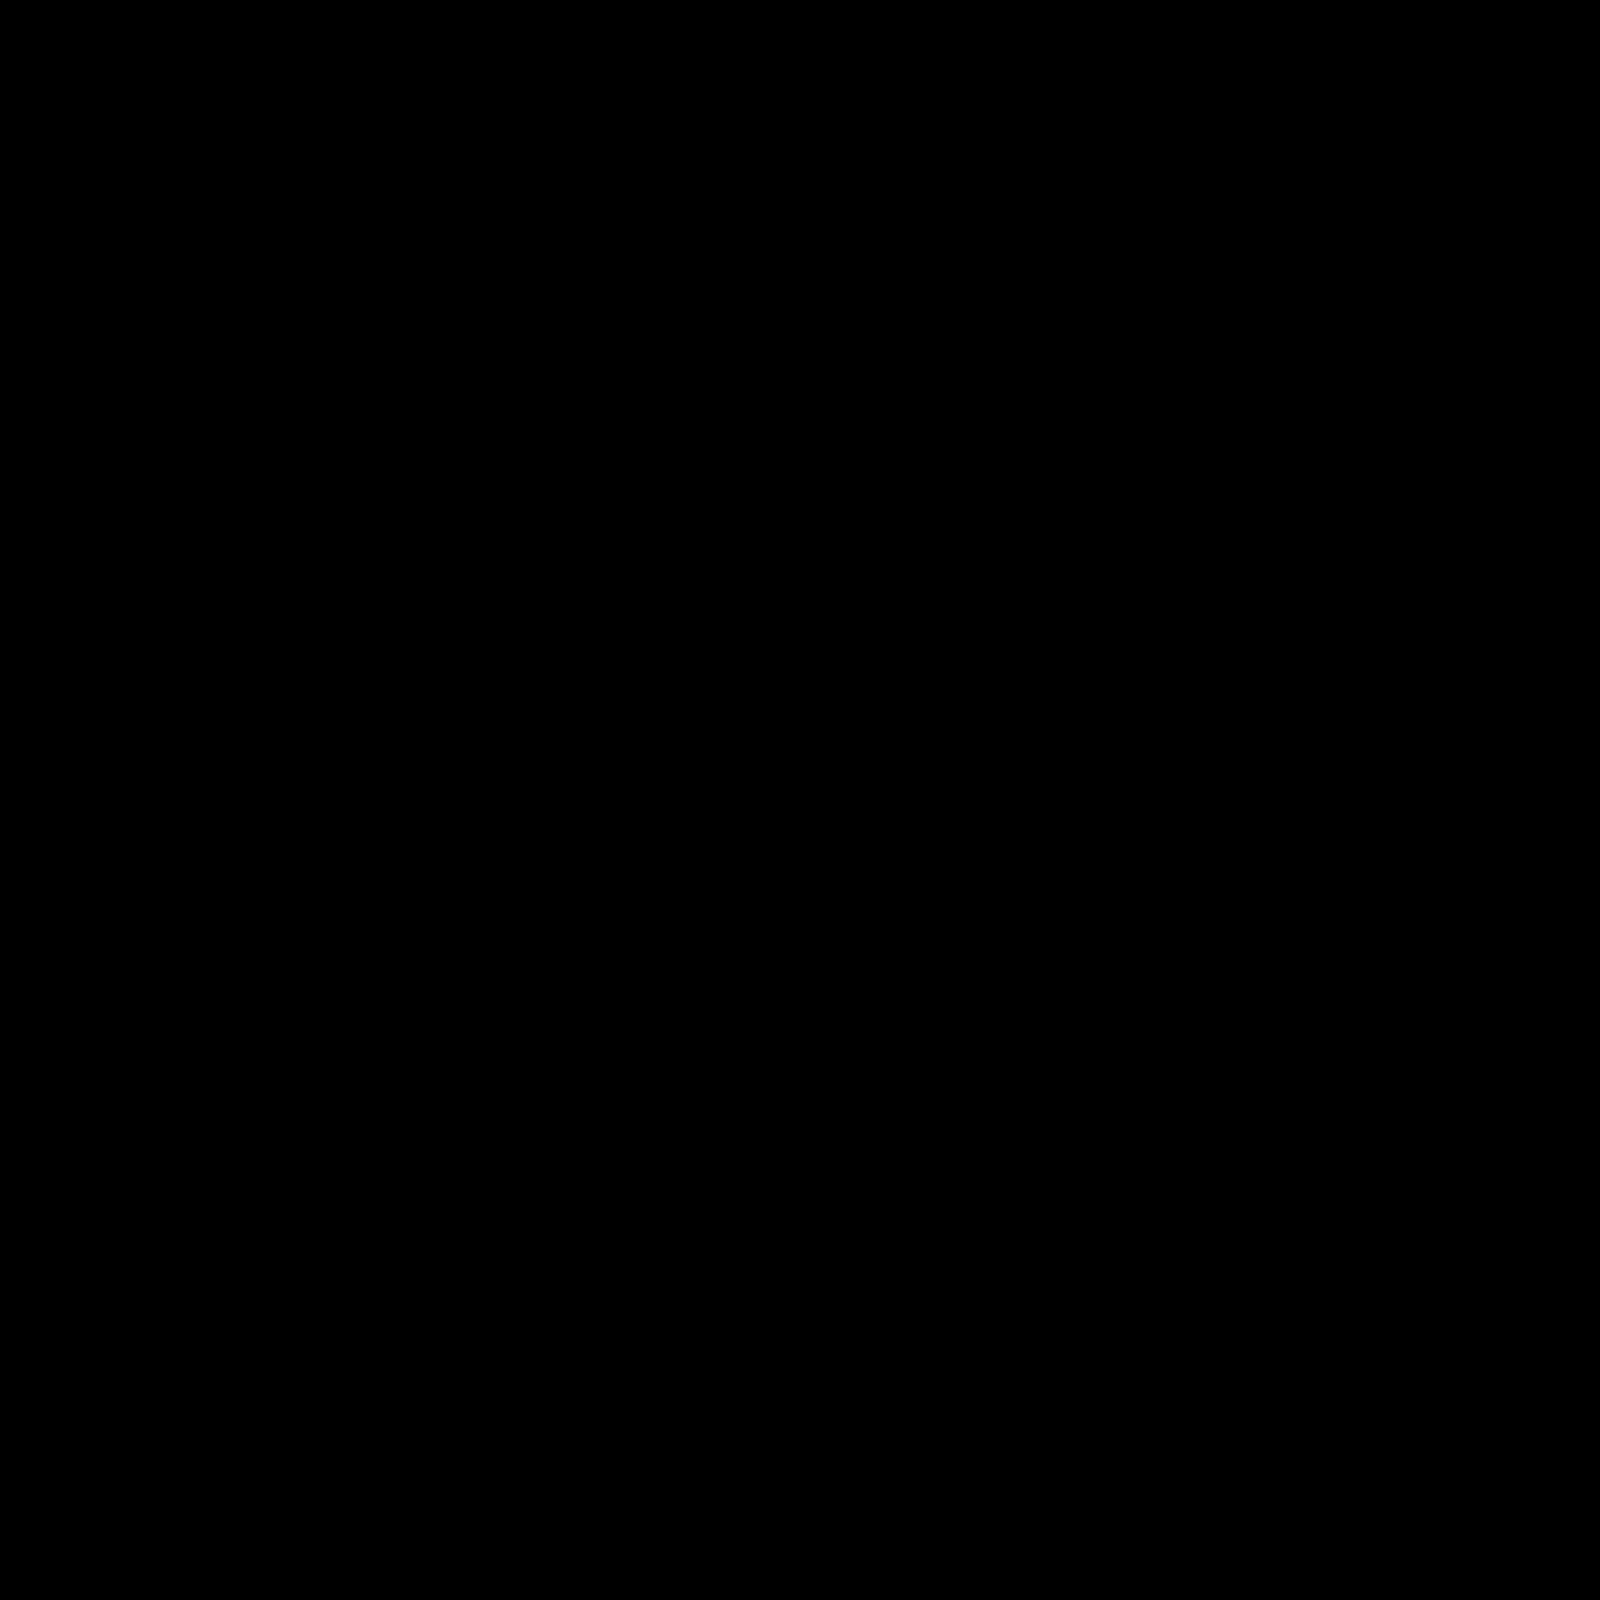 picture transparent stock Vector append lab2 sub. Add subnode icon free